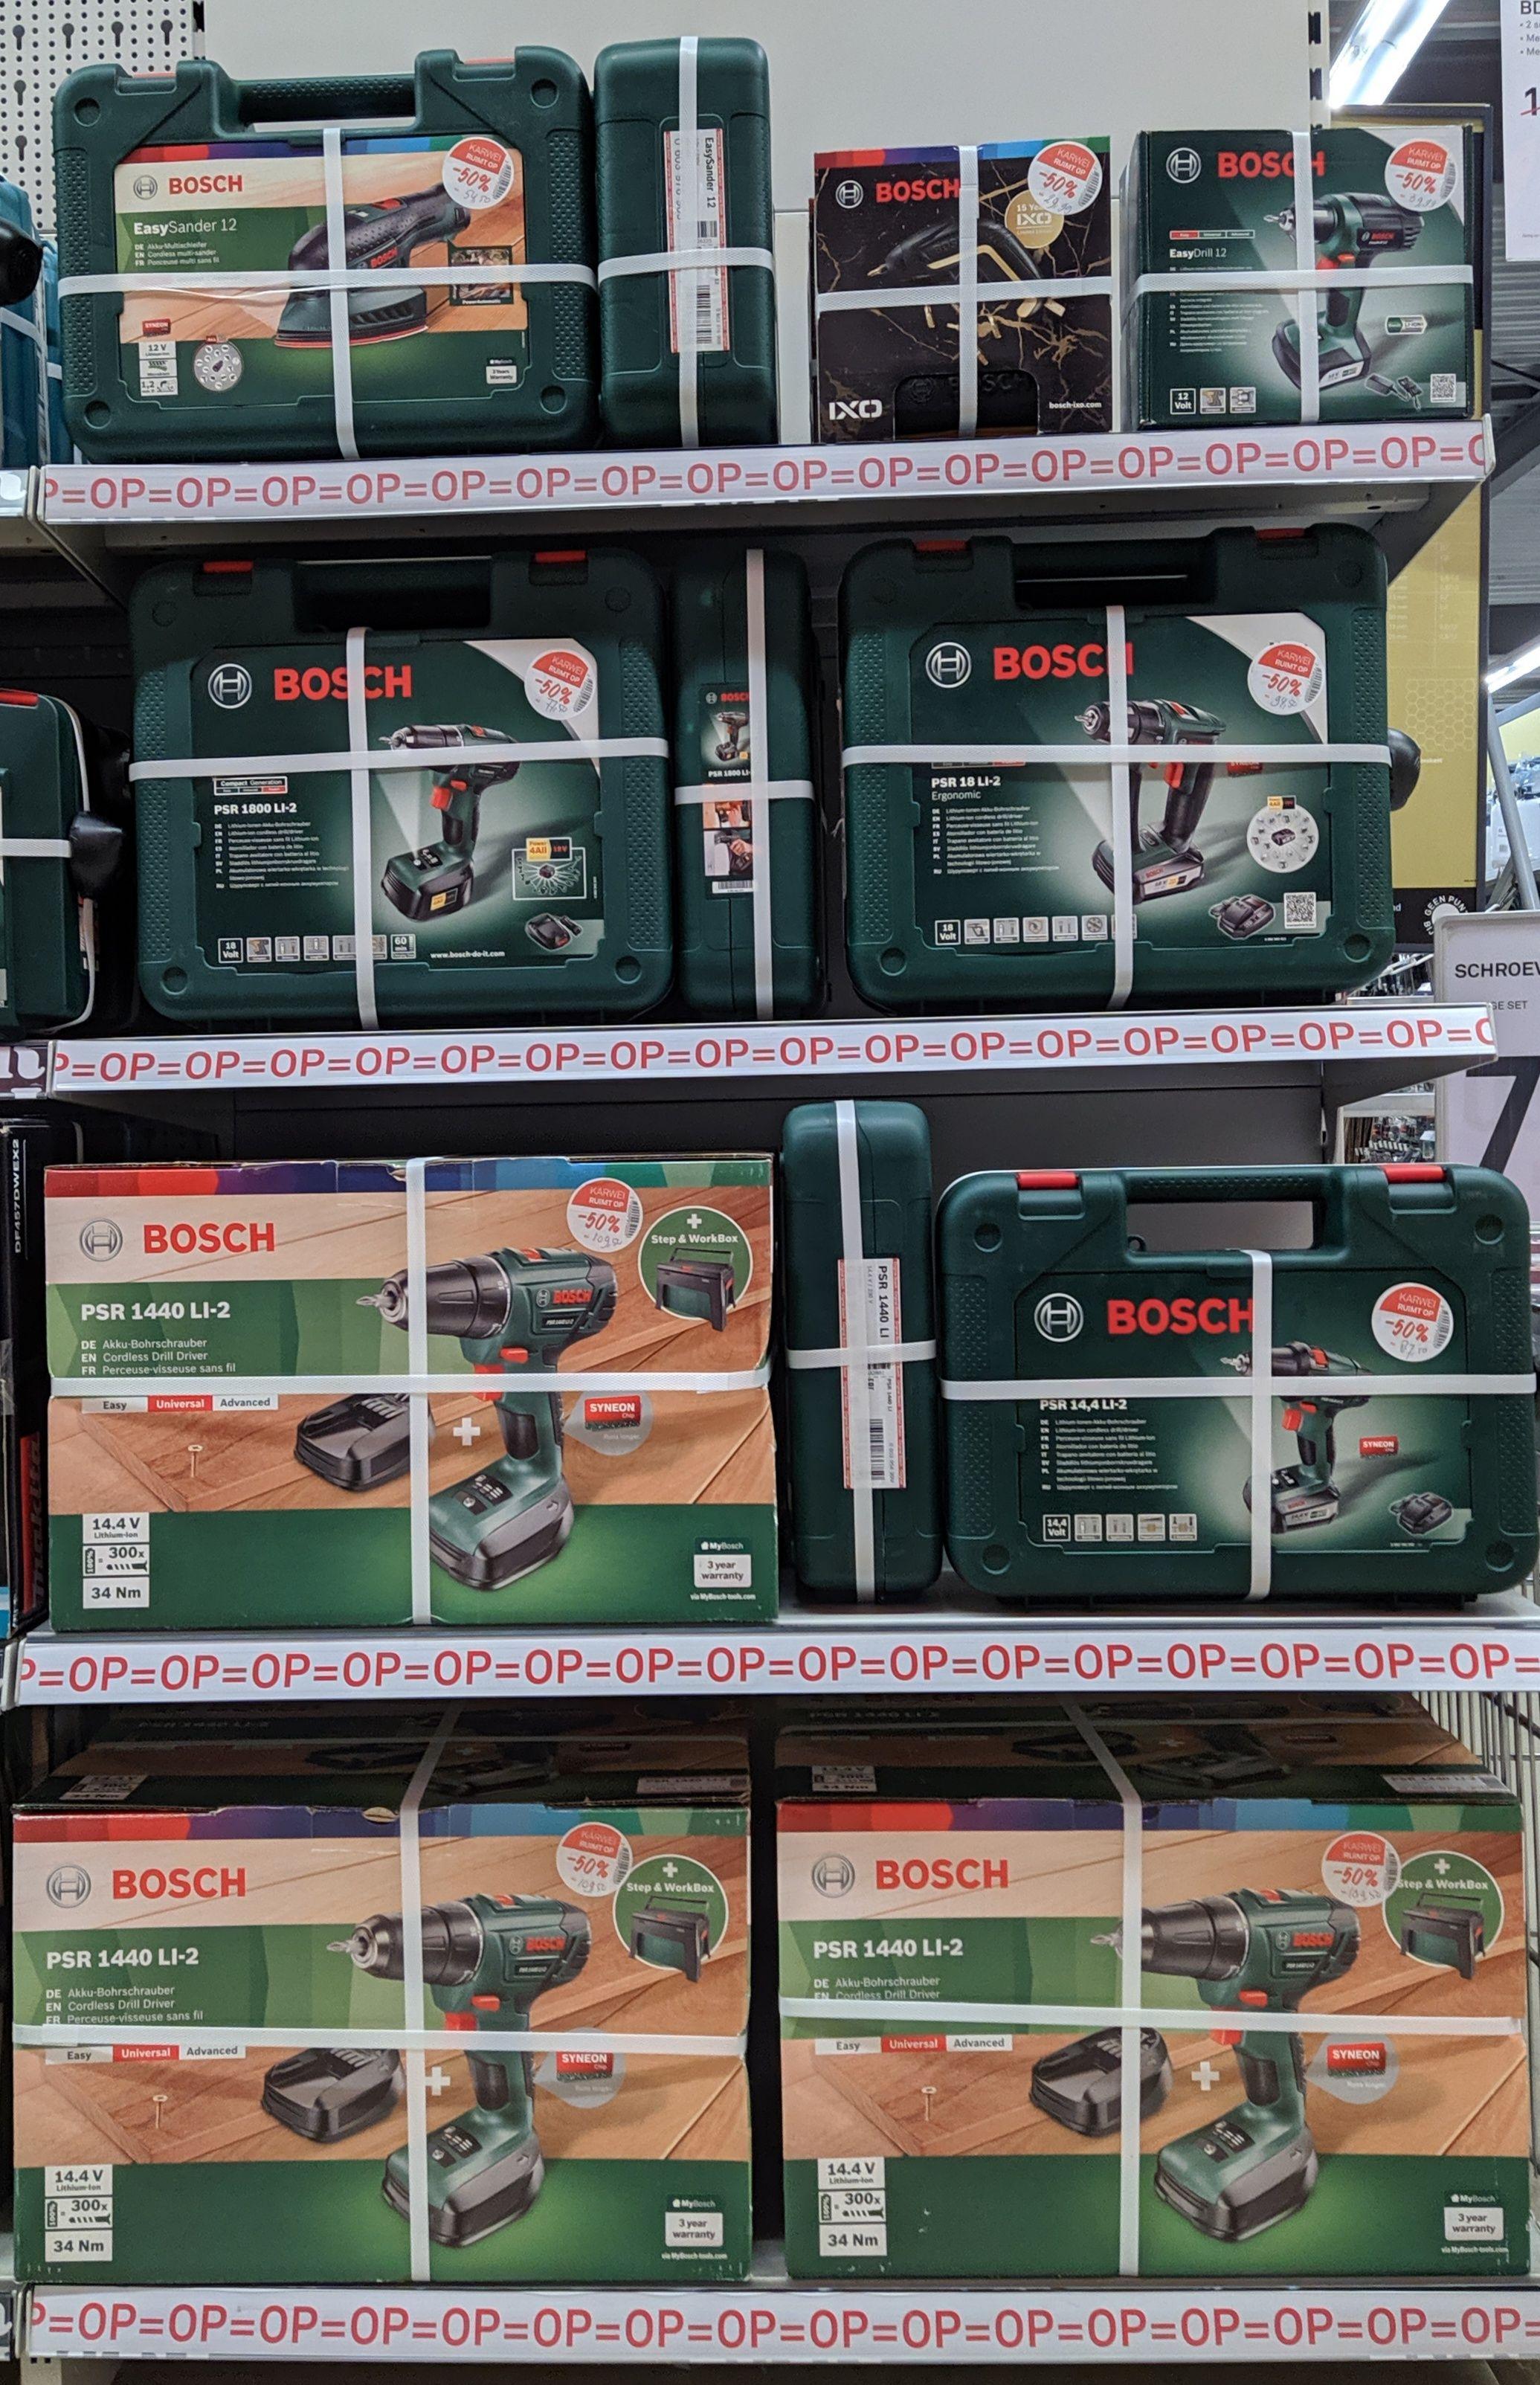 Lokaal - Bosch gereedschap 50% korting Karwei Doetinchem